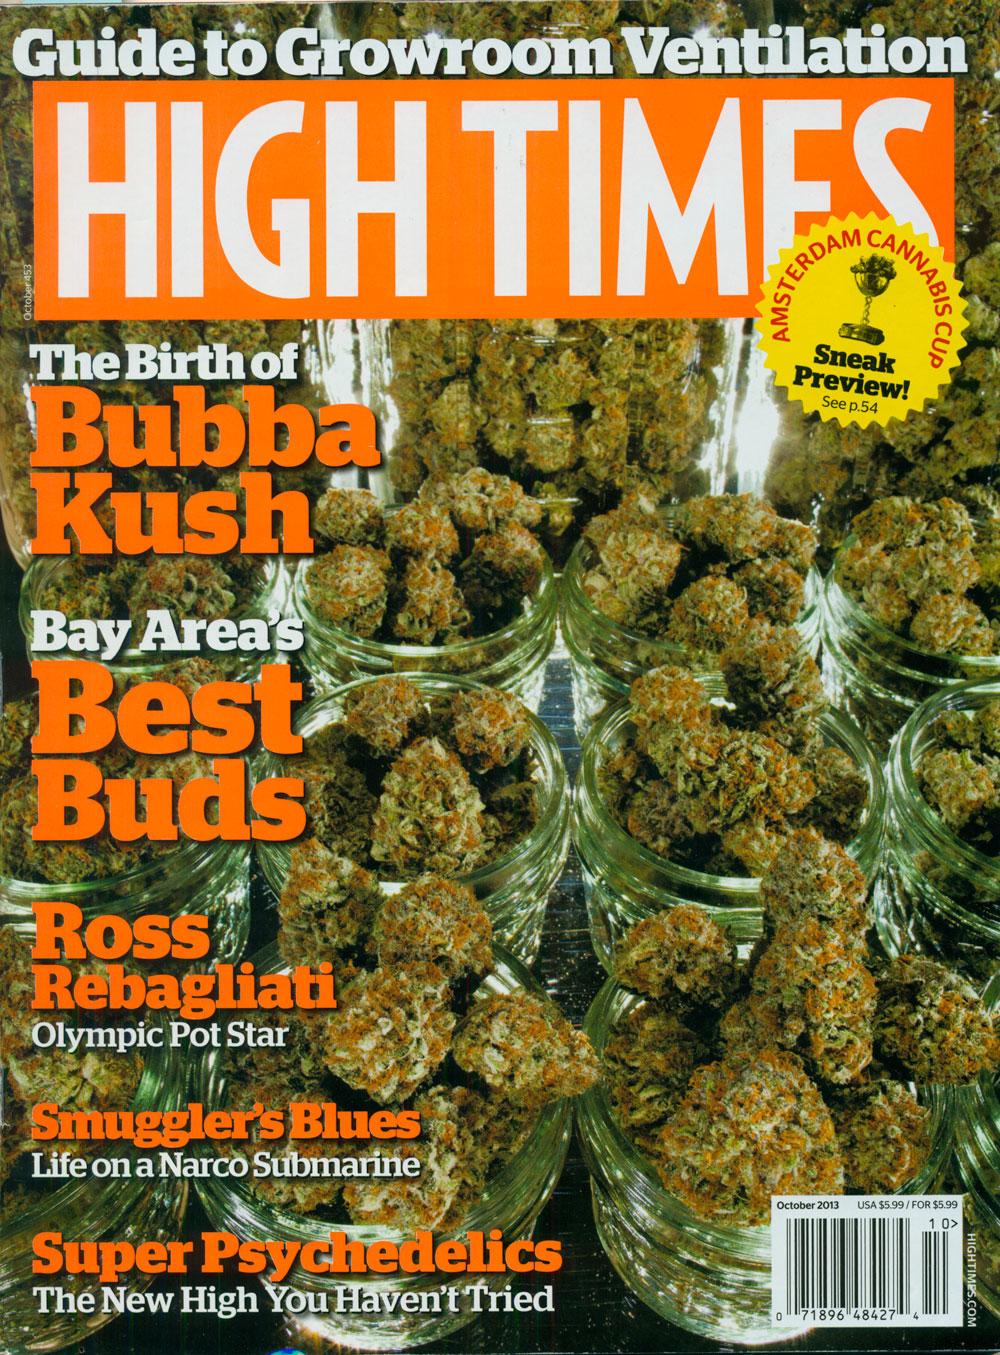 High-Times-Cover.jpg